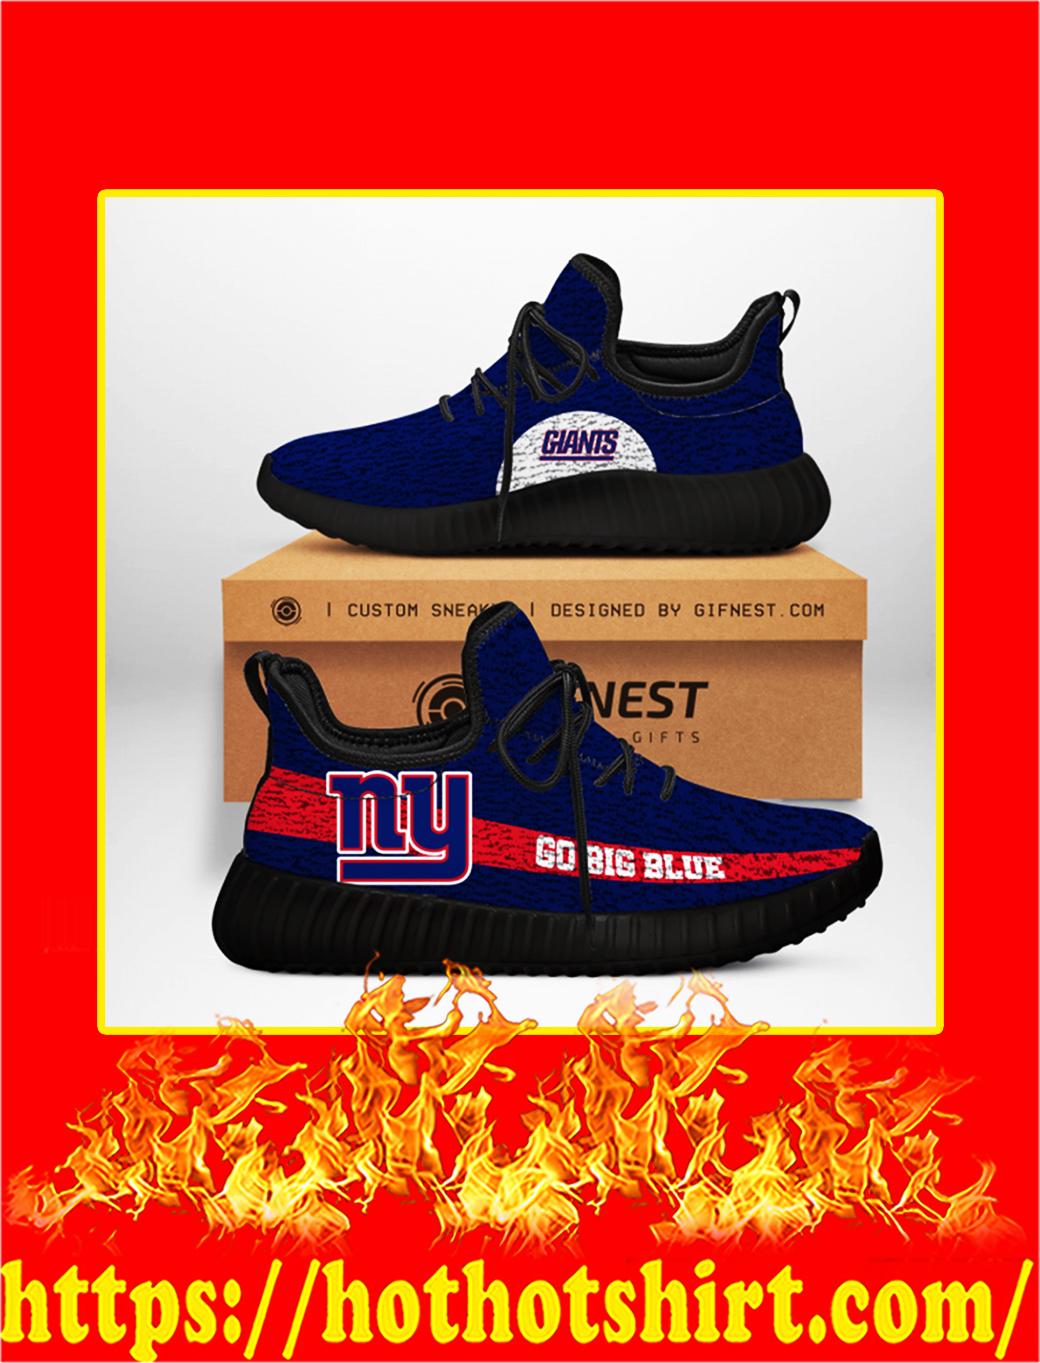 Go Big Blue New York Giants NFL Yeezy Sneaker - black